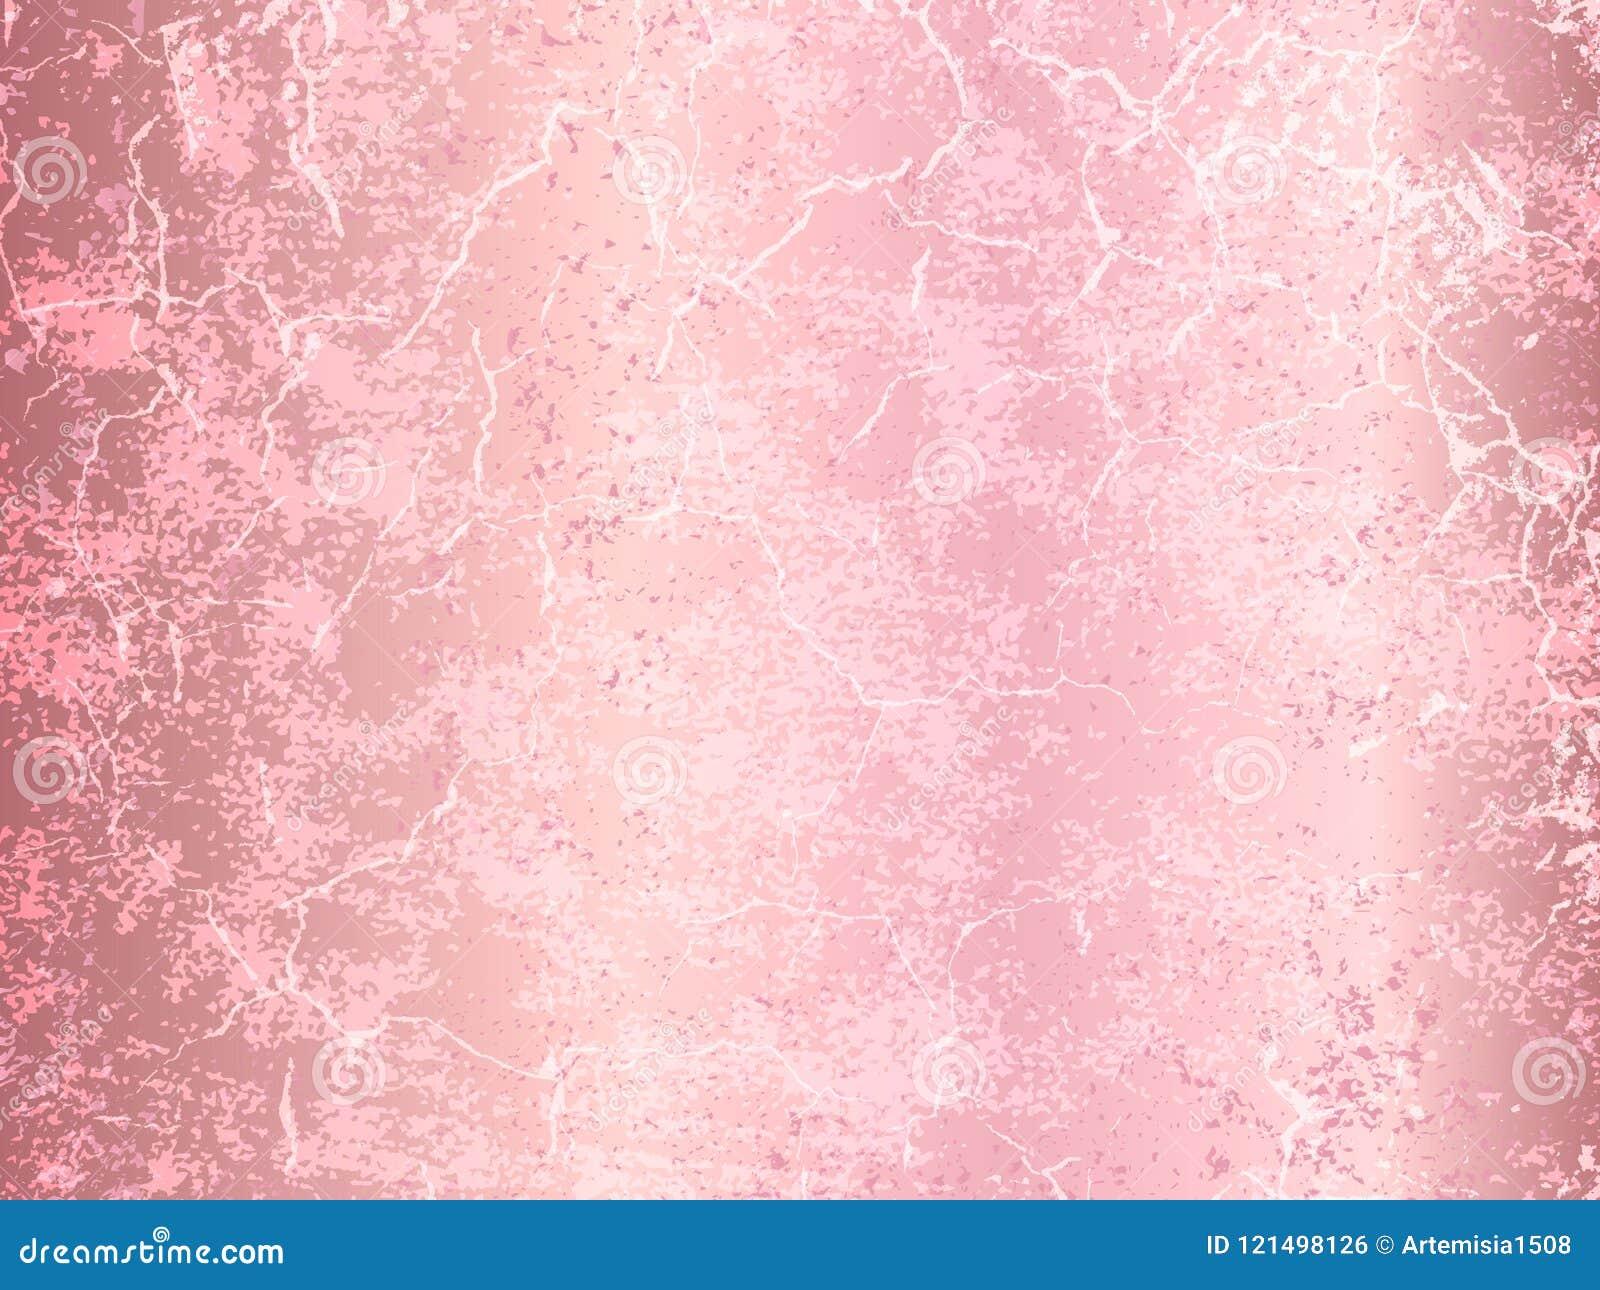 Vector Rose Gold Marble Background Rose Gold Metallic Texture Stock Vector Illustration Of Light Invitation 121498126